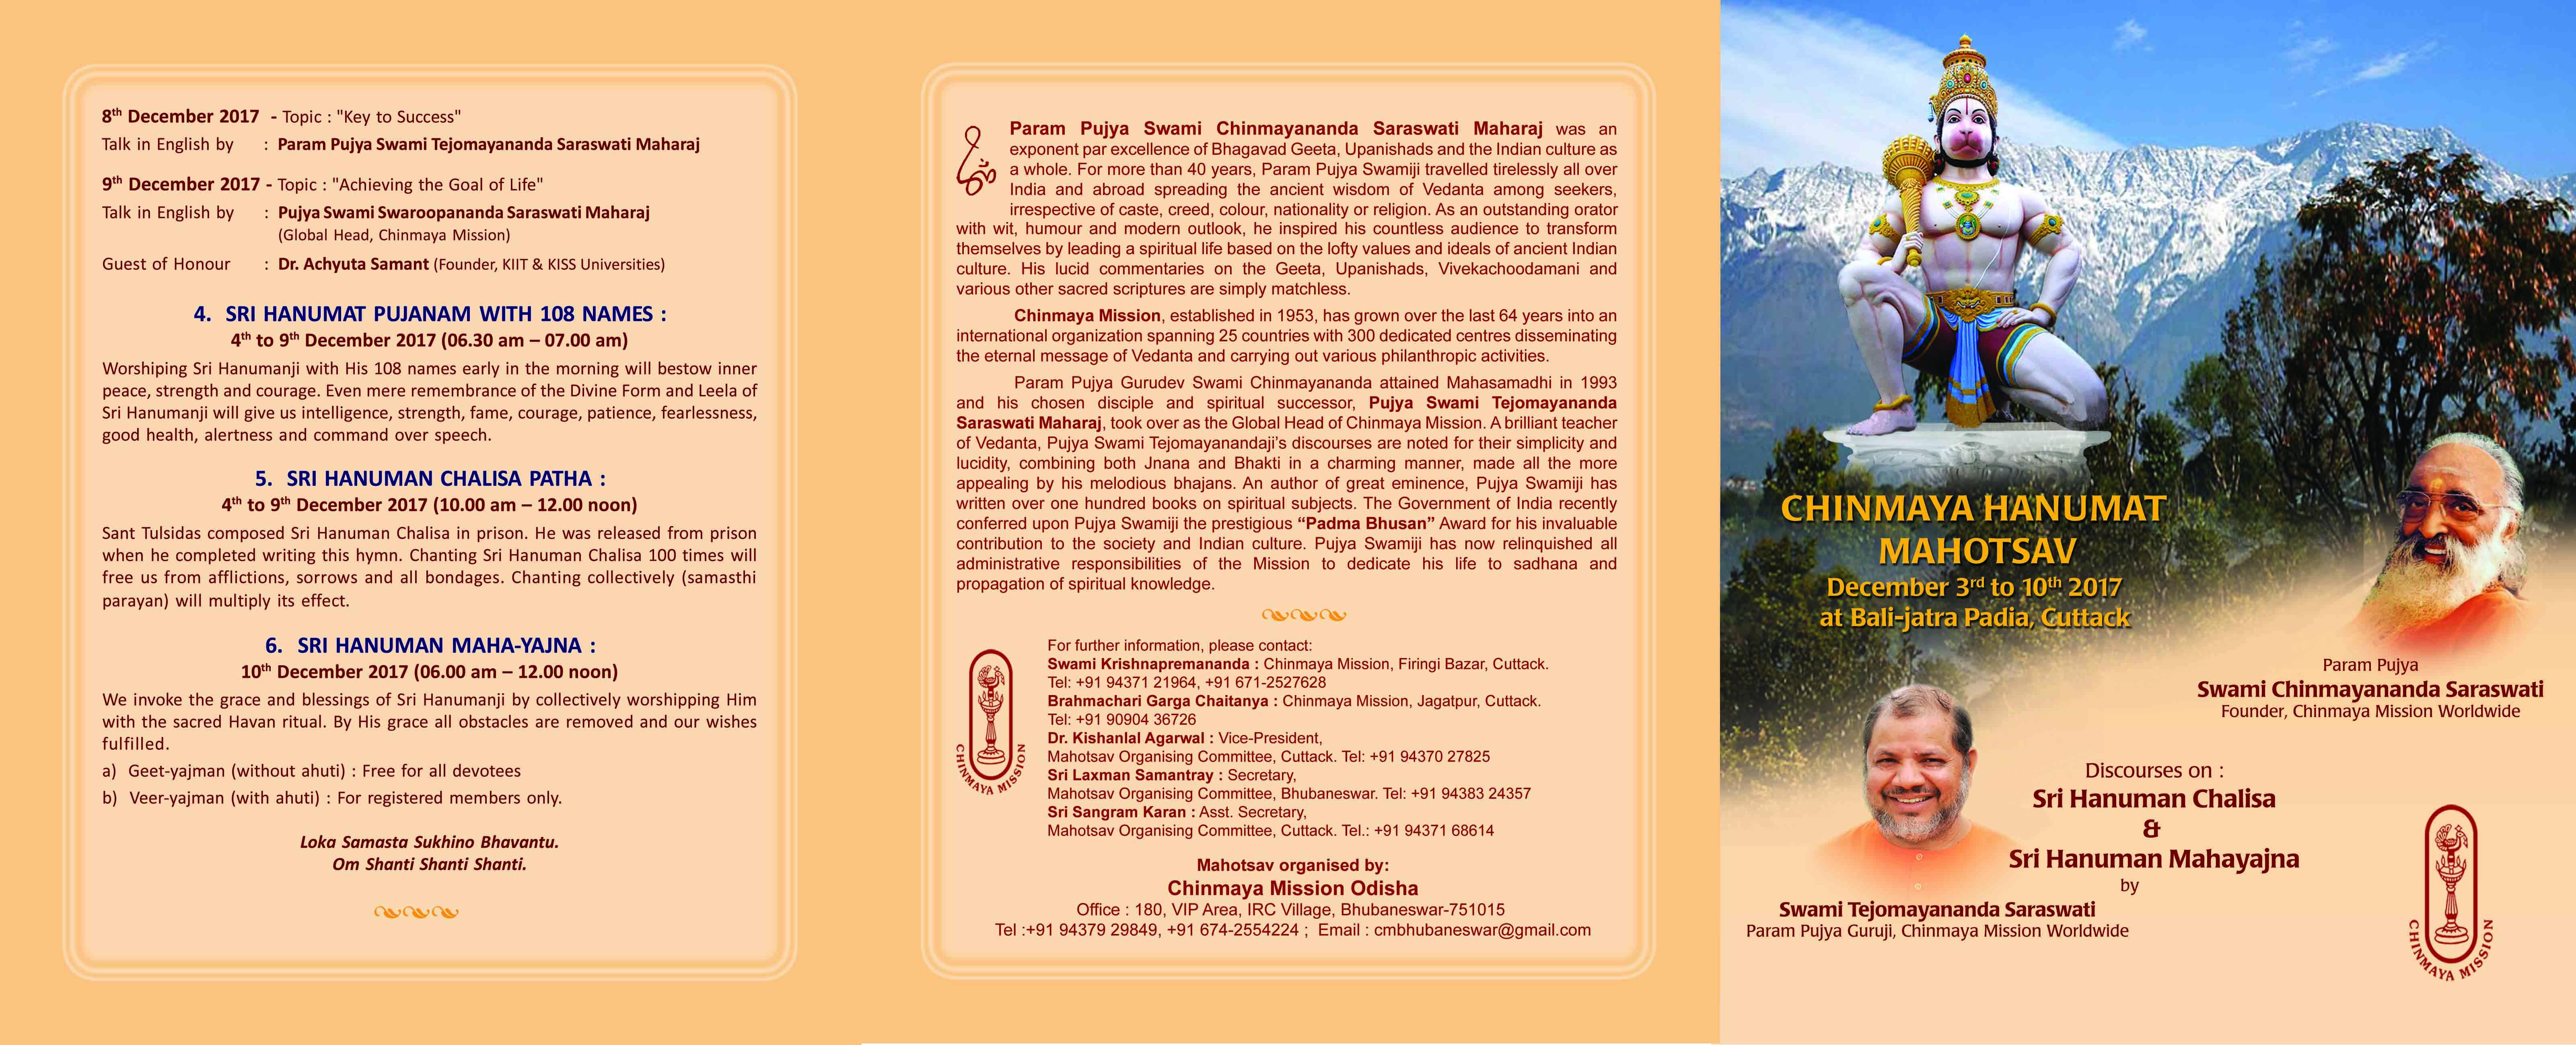 Shri Chinmaya Hanumat Mahotsav | Chinmaya Mission WorldwideChinmaya